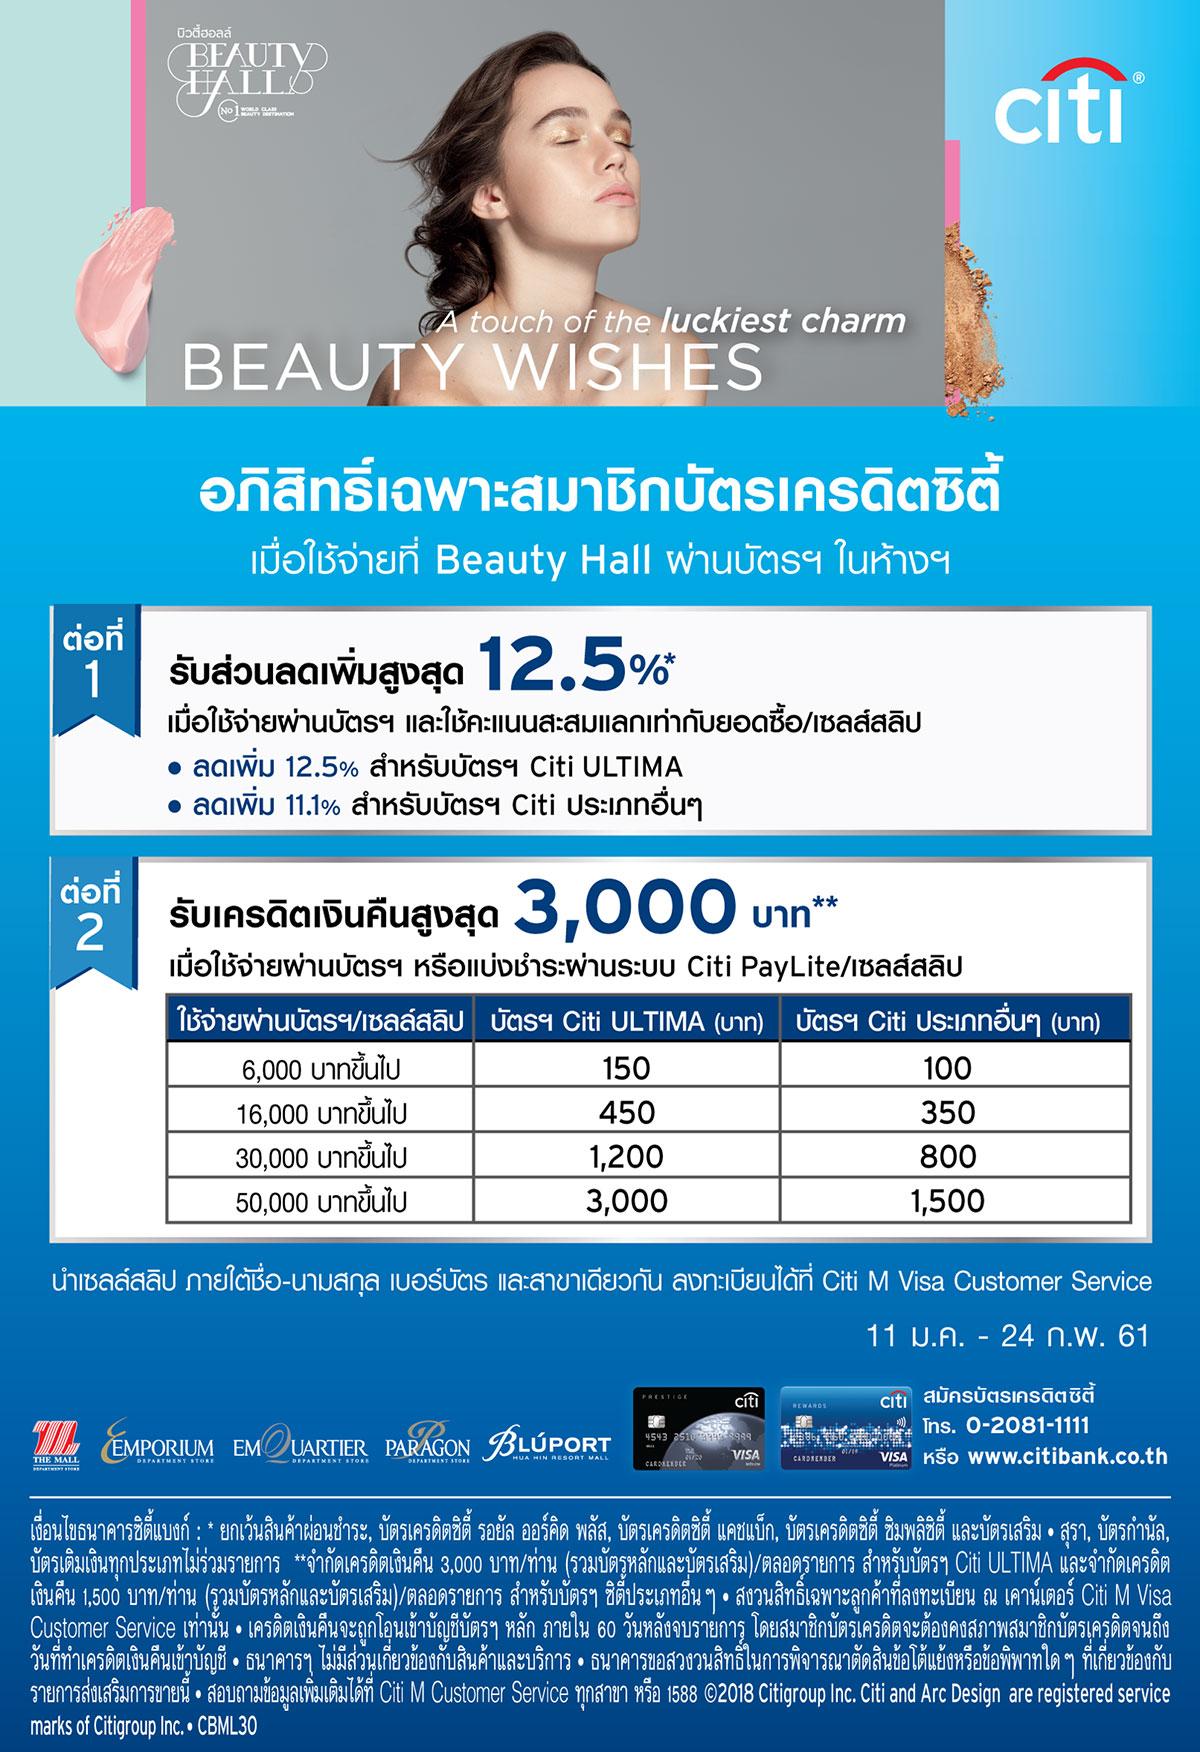 Citi Bank Beauty Wish - Emporium